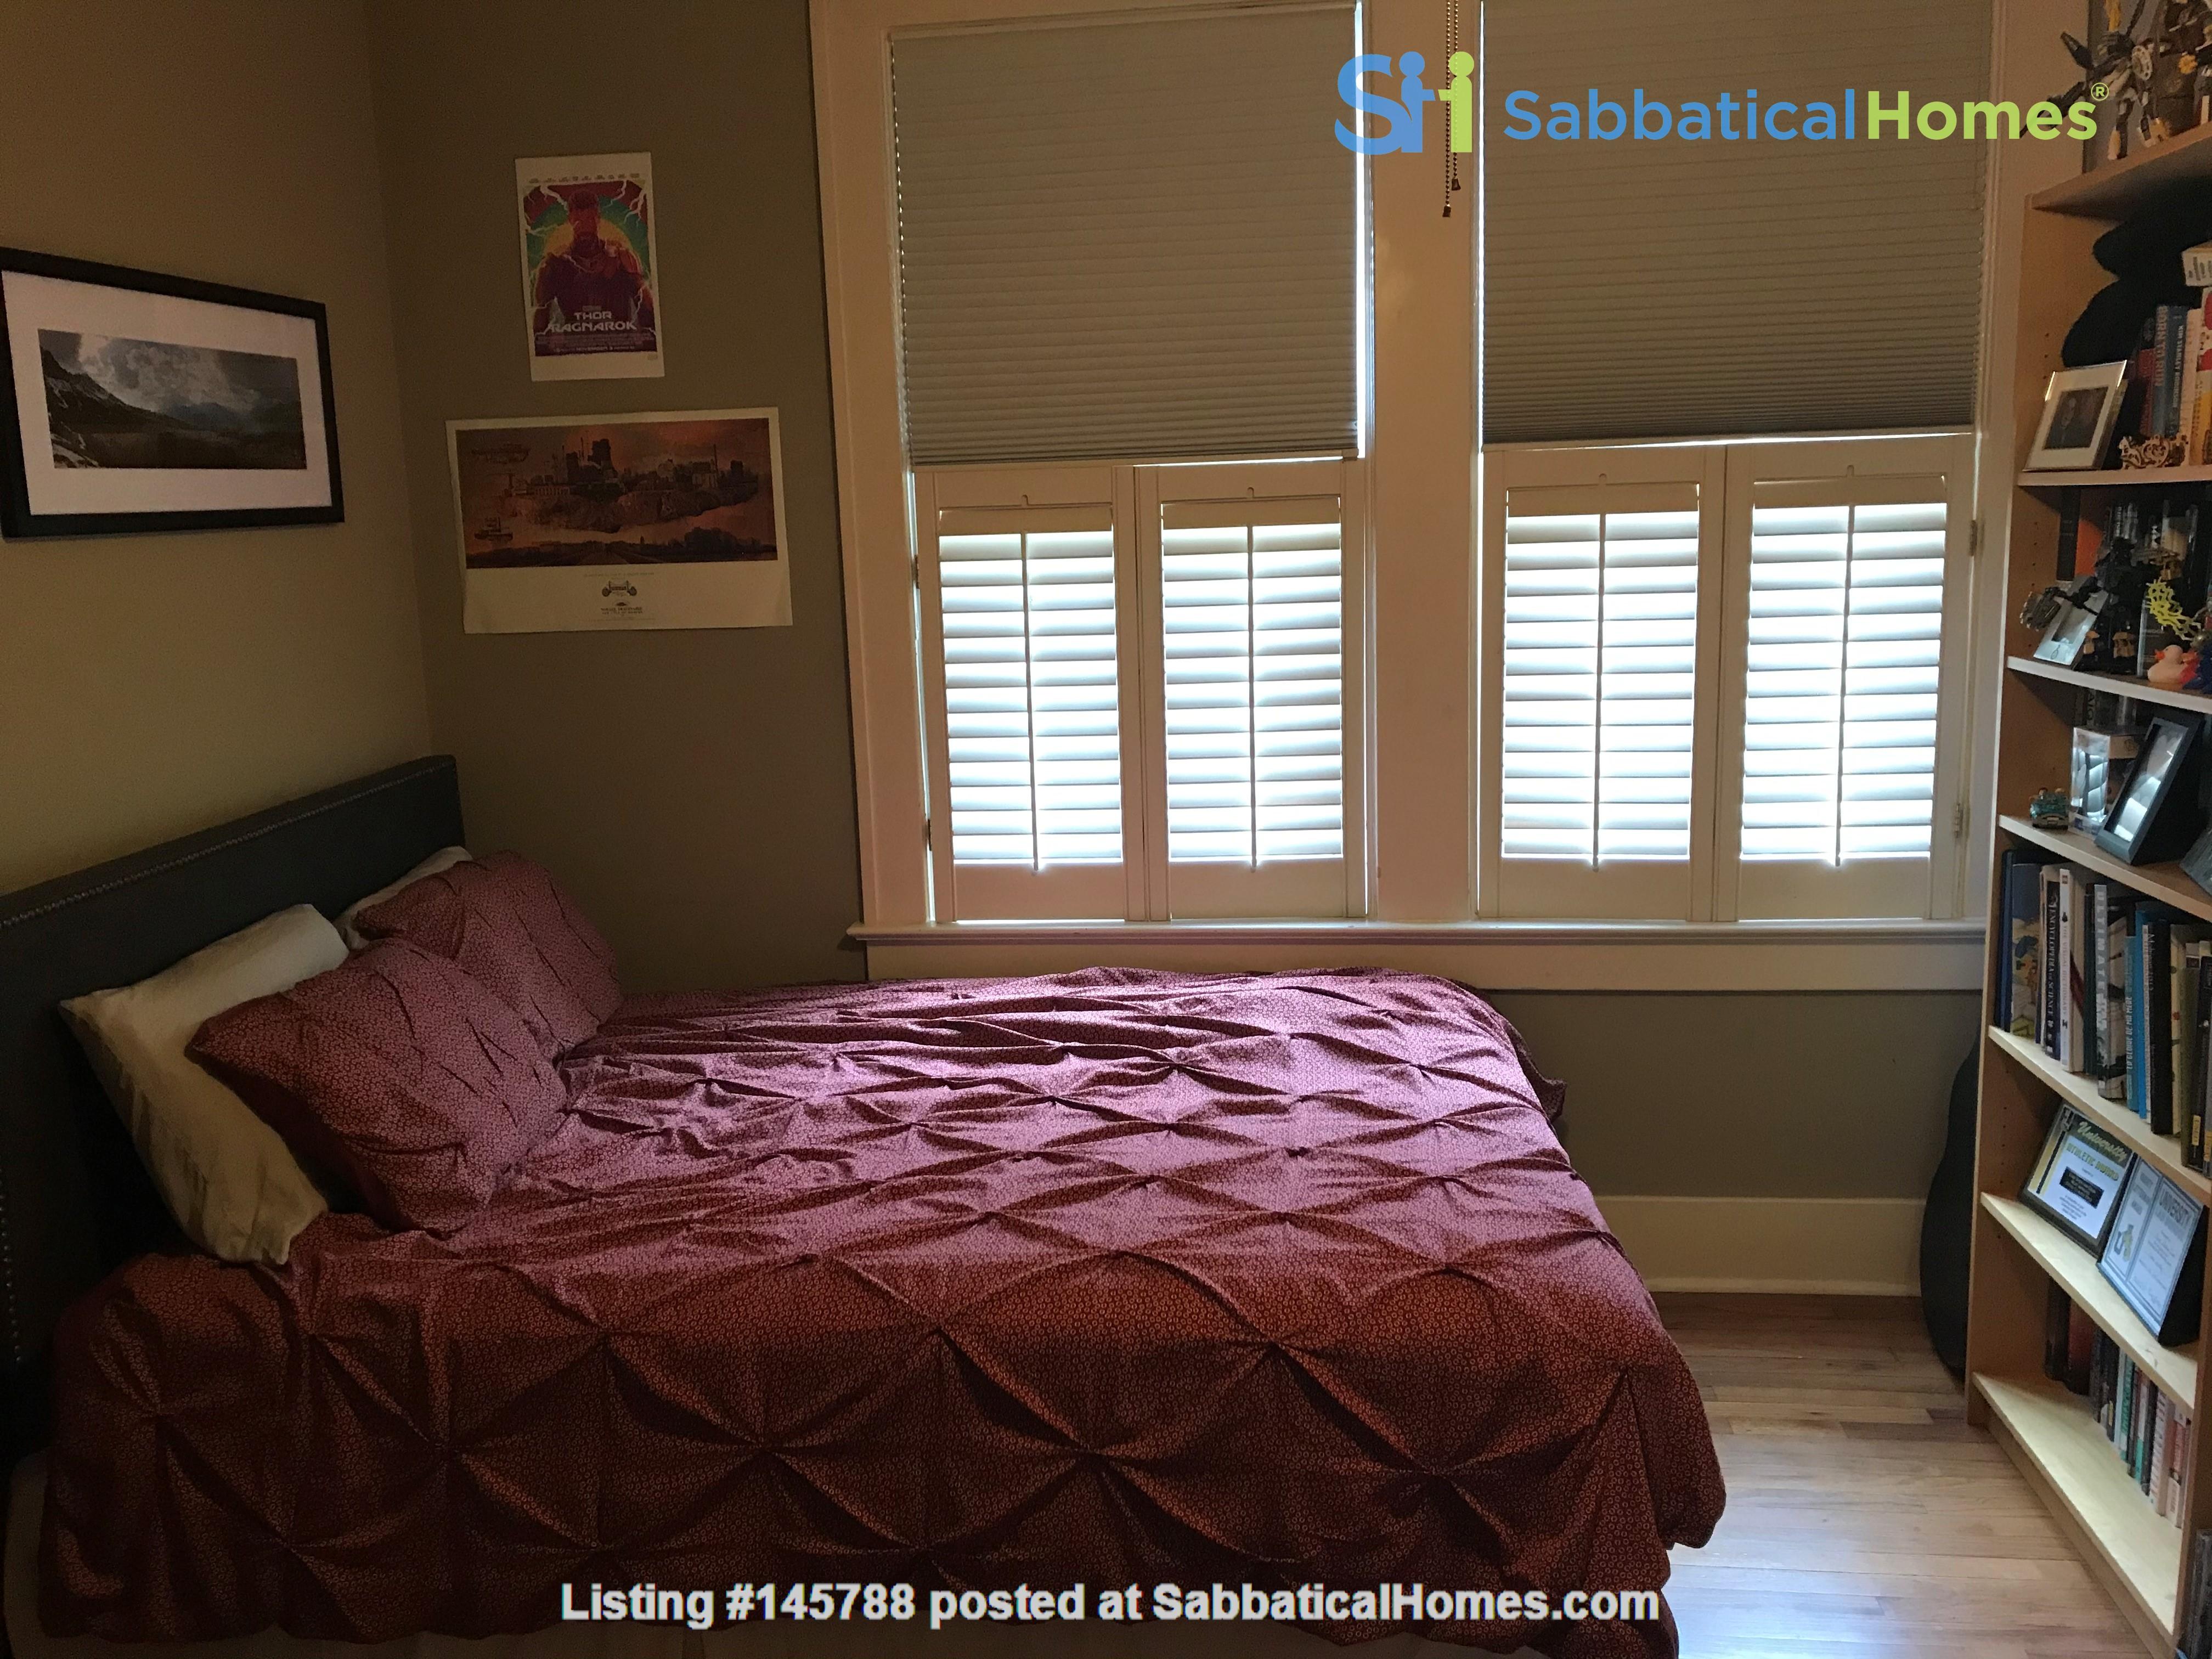 Charming 3 bedroom bungalow in Baton Rouge, Louisiana near LSU Home Rental in Baton Rouge 8